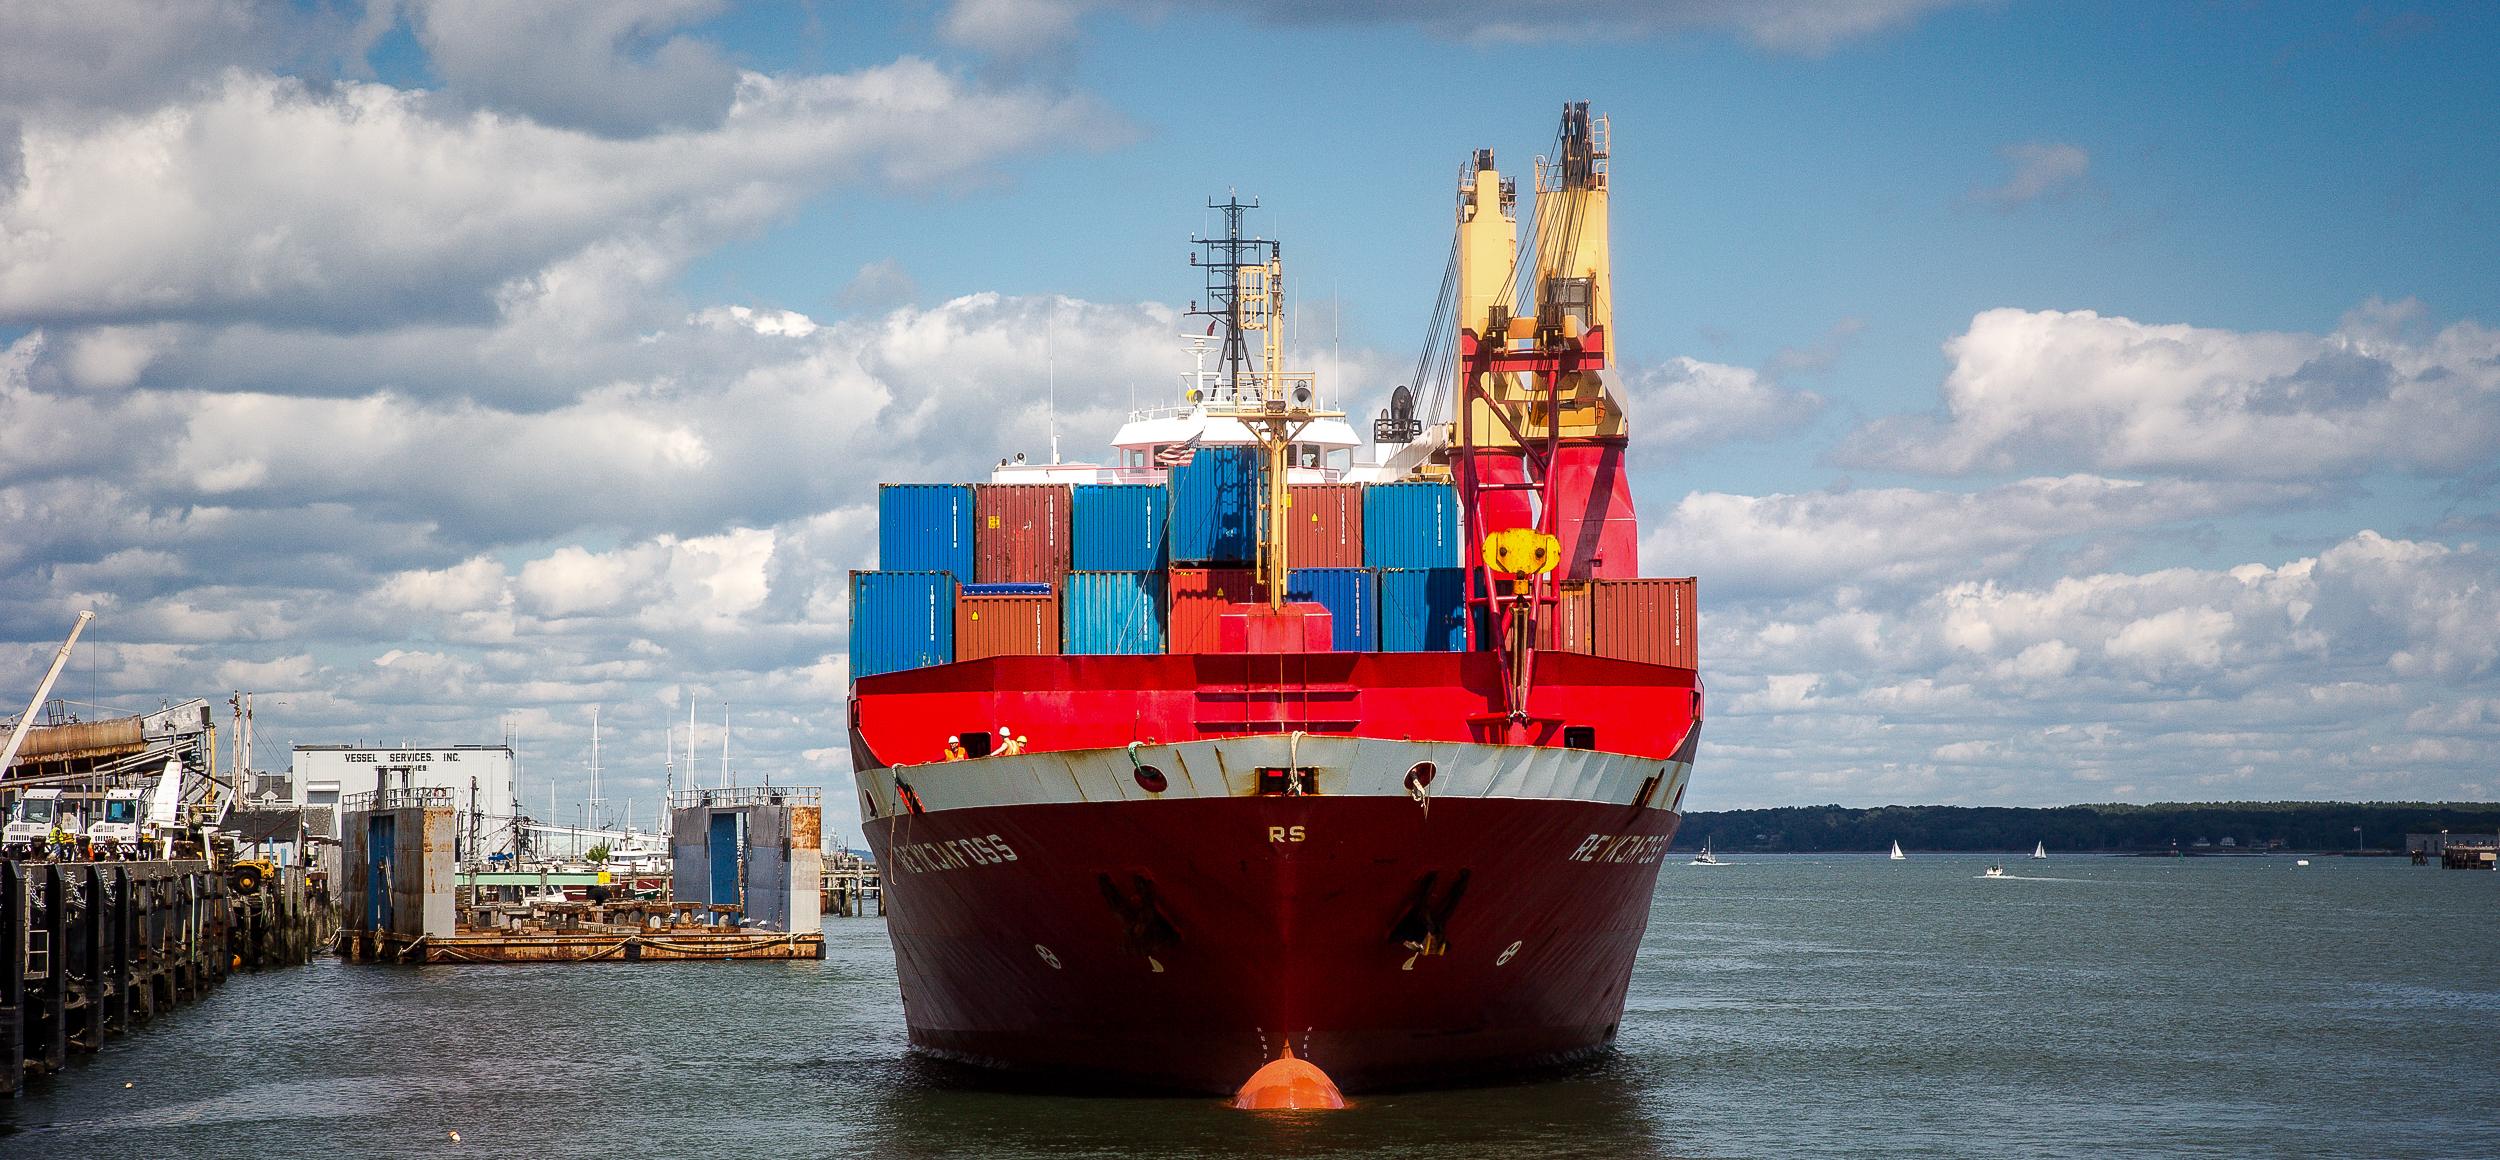 Eimskip freight ship in Portland's harbour. JONAA©Justin Levesque